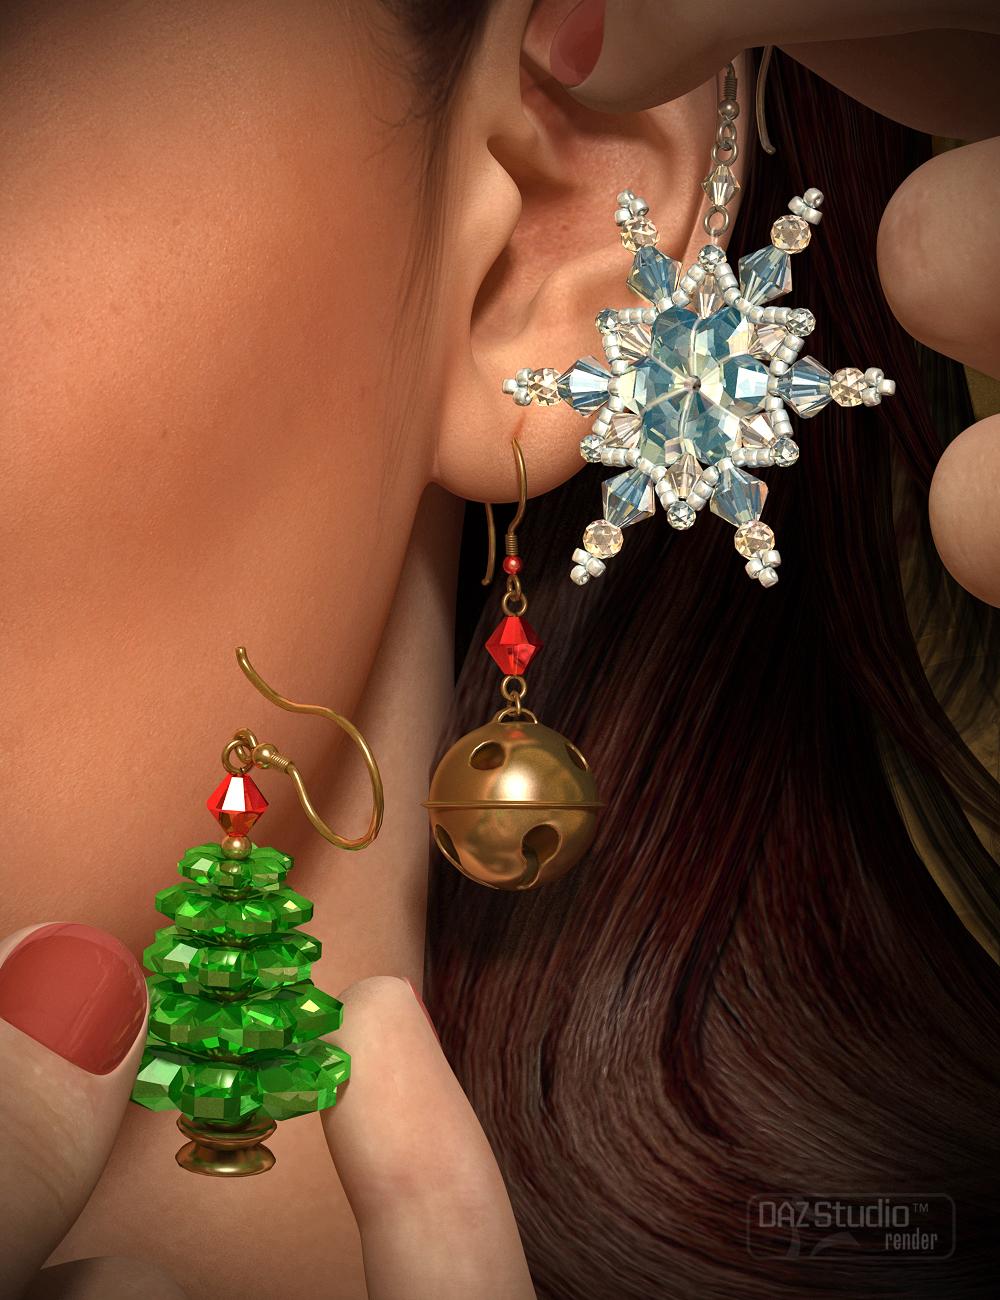 Christmas Earrings for Genesis 2 Female(s) by: Fisty & Darc, 3D Models by Daz 3D